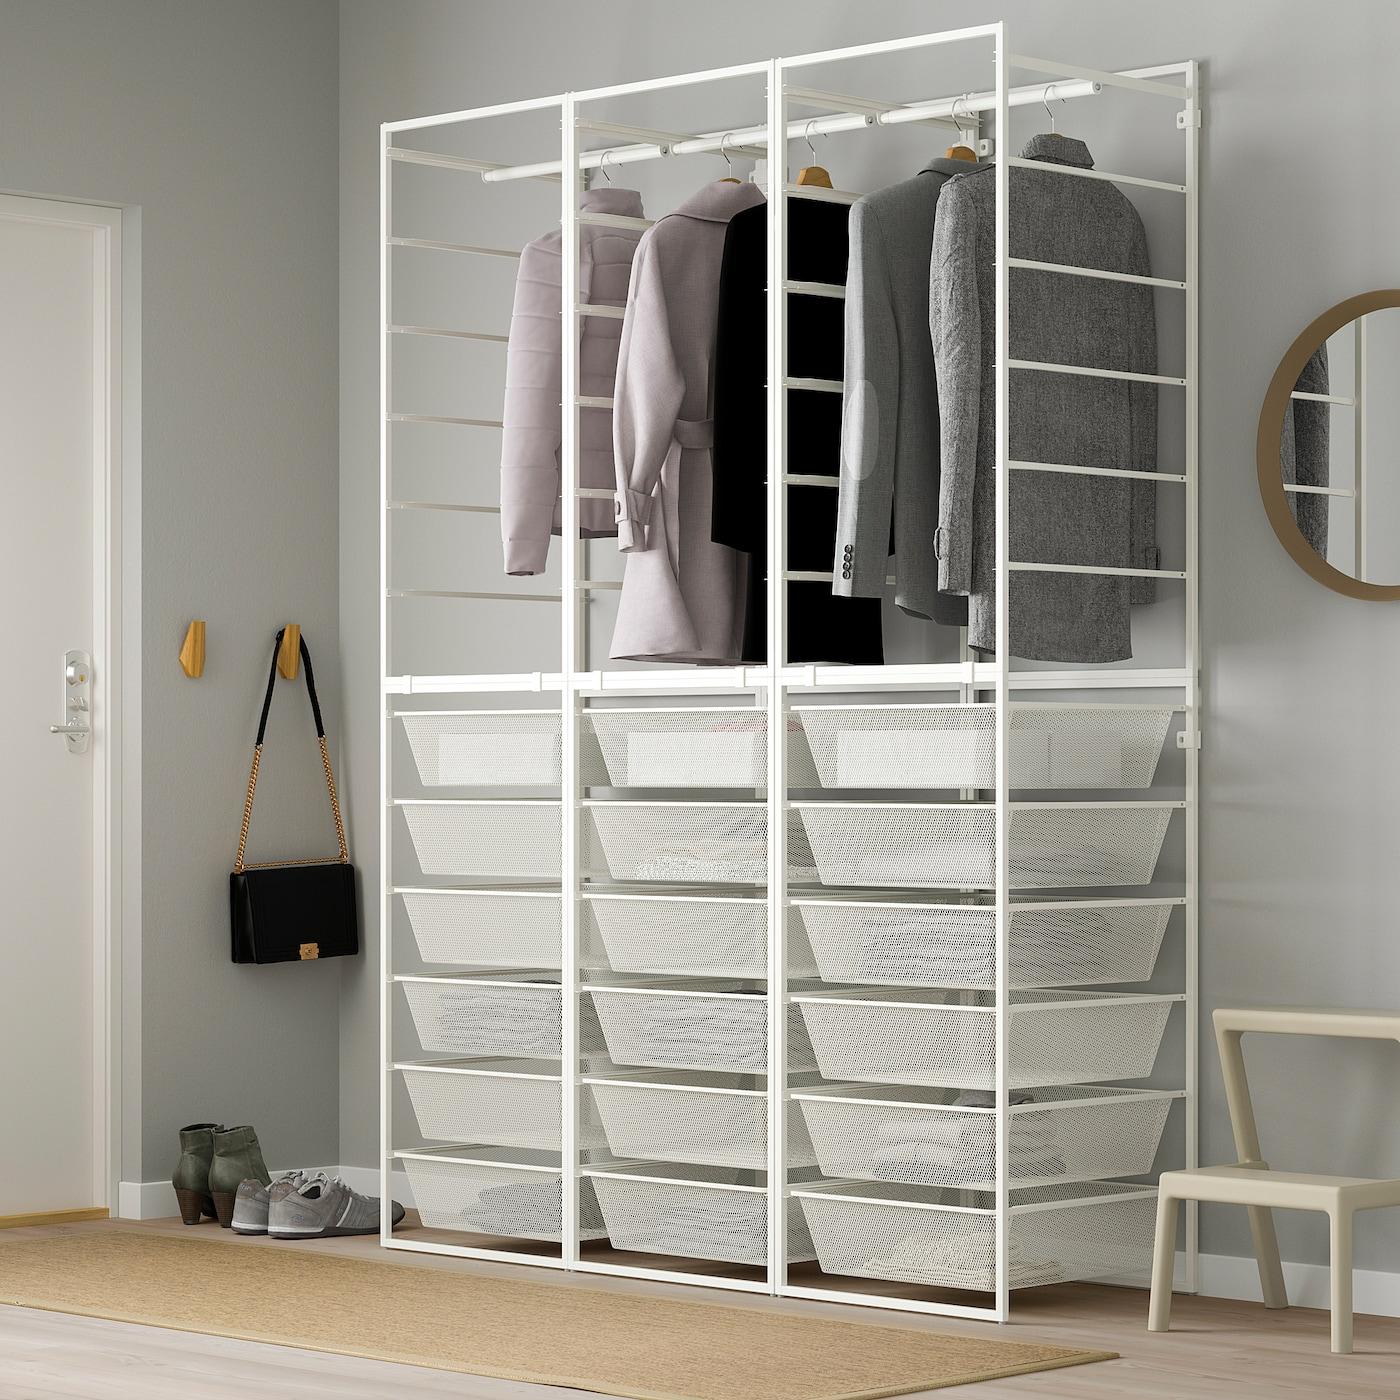 JONAXEL Mandhouder/fijndraadmand/kledingroe, wit, 148x51x207 cm